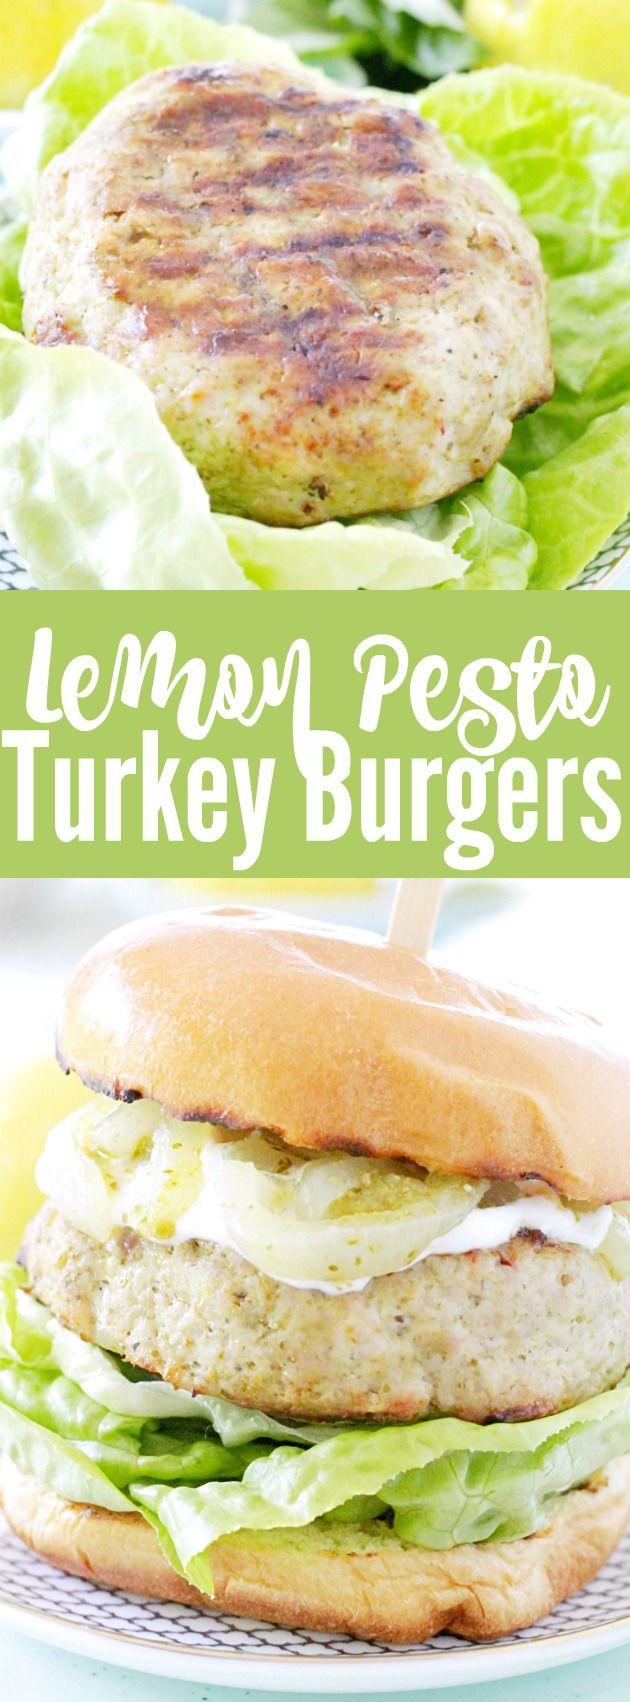 Lemon Pesto Turkey Burgers